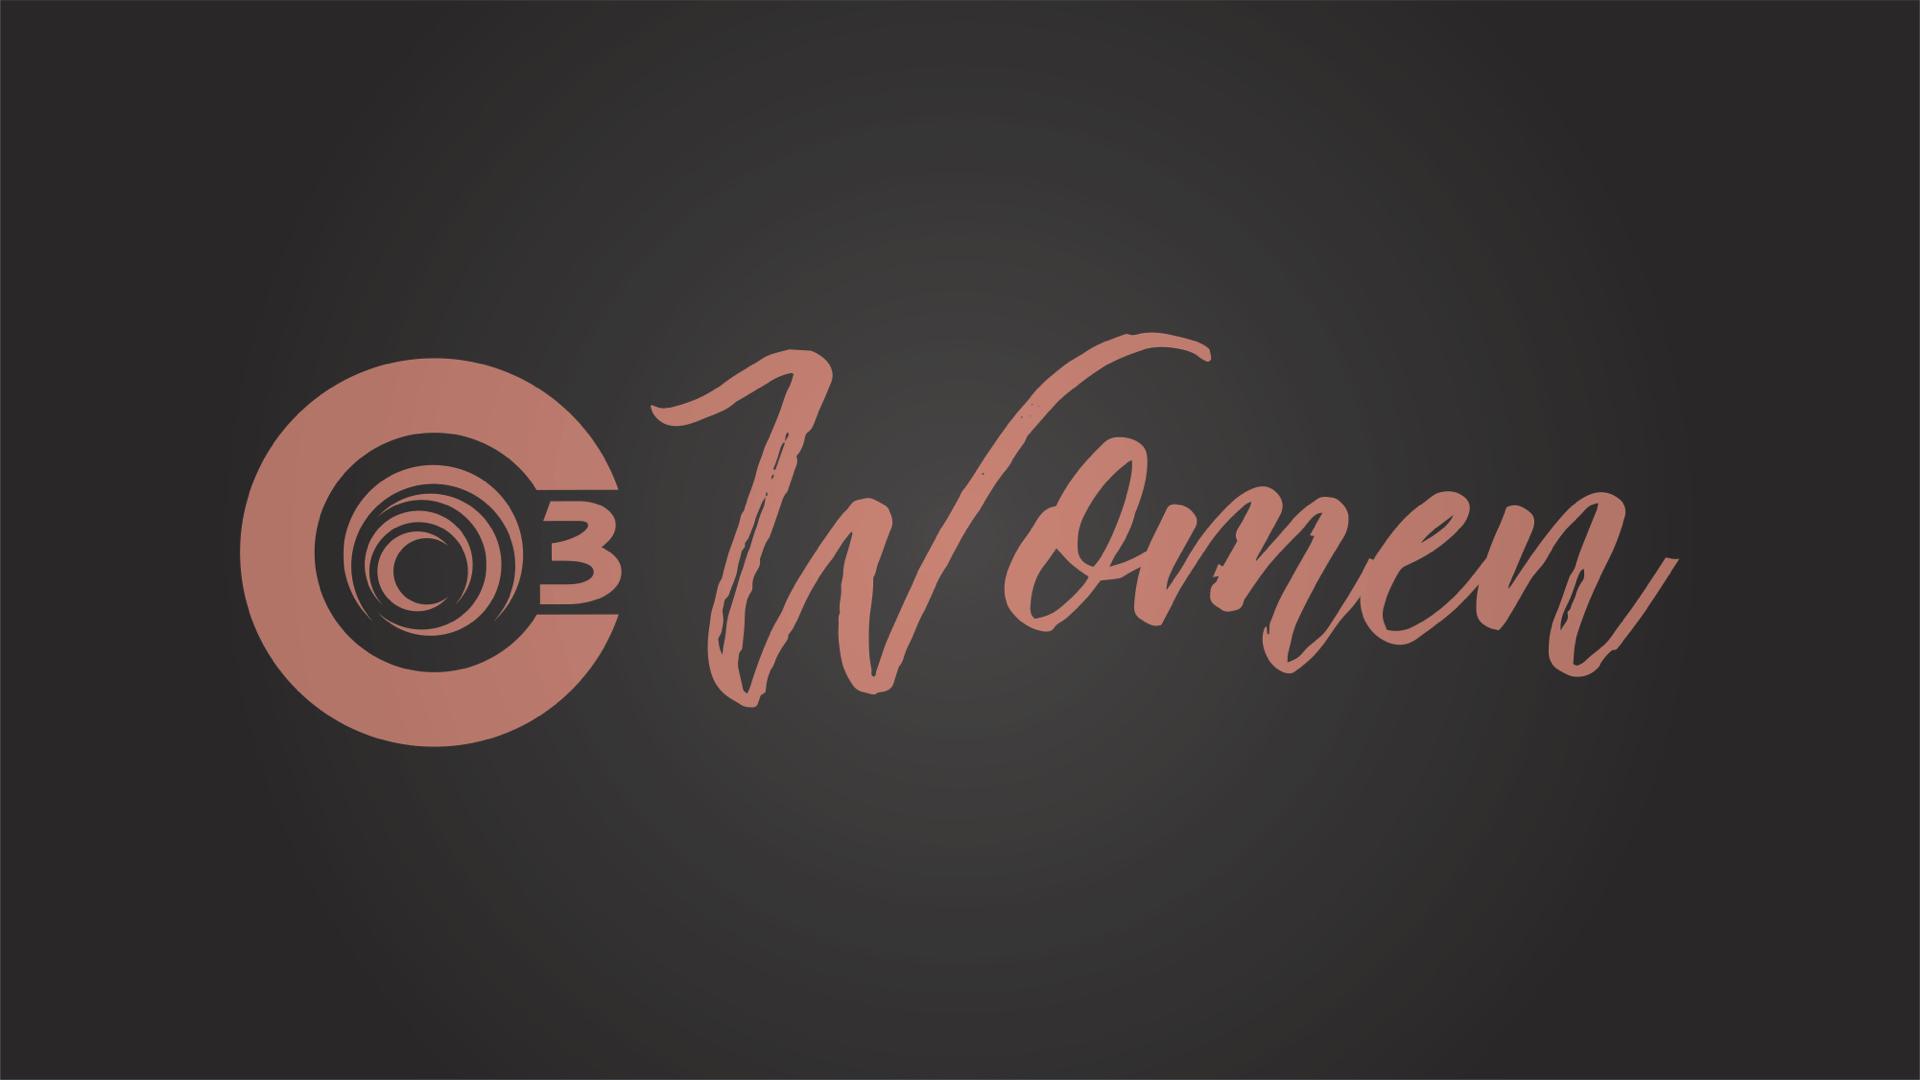 C3Women_Image.jpeg